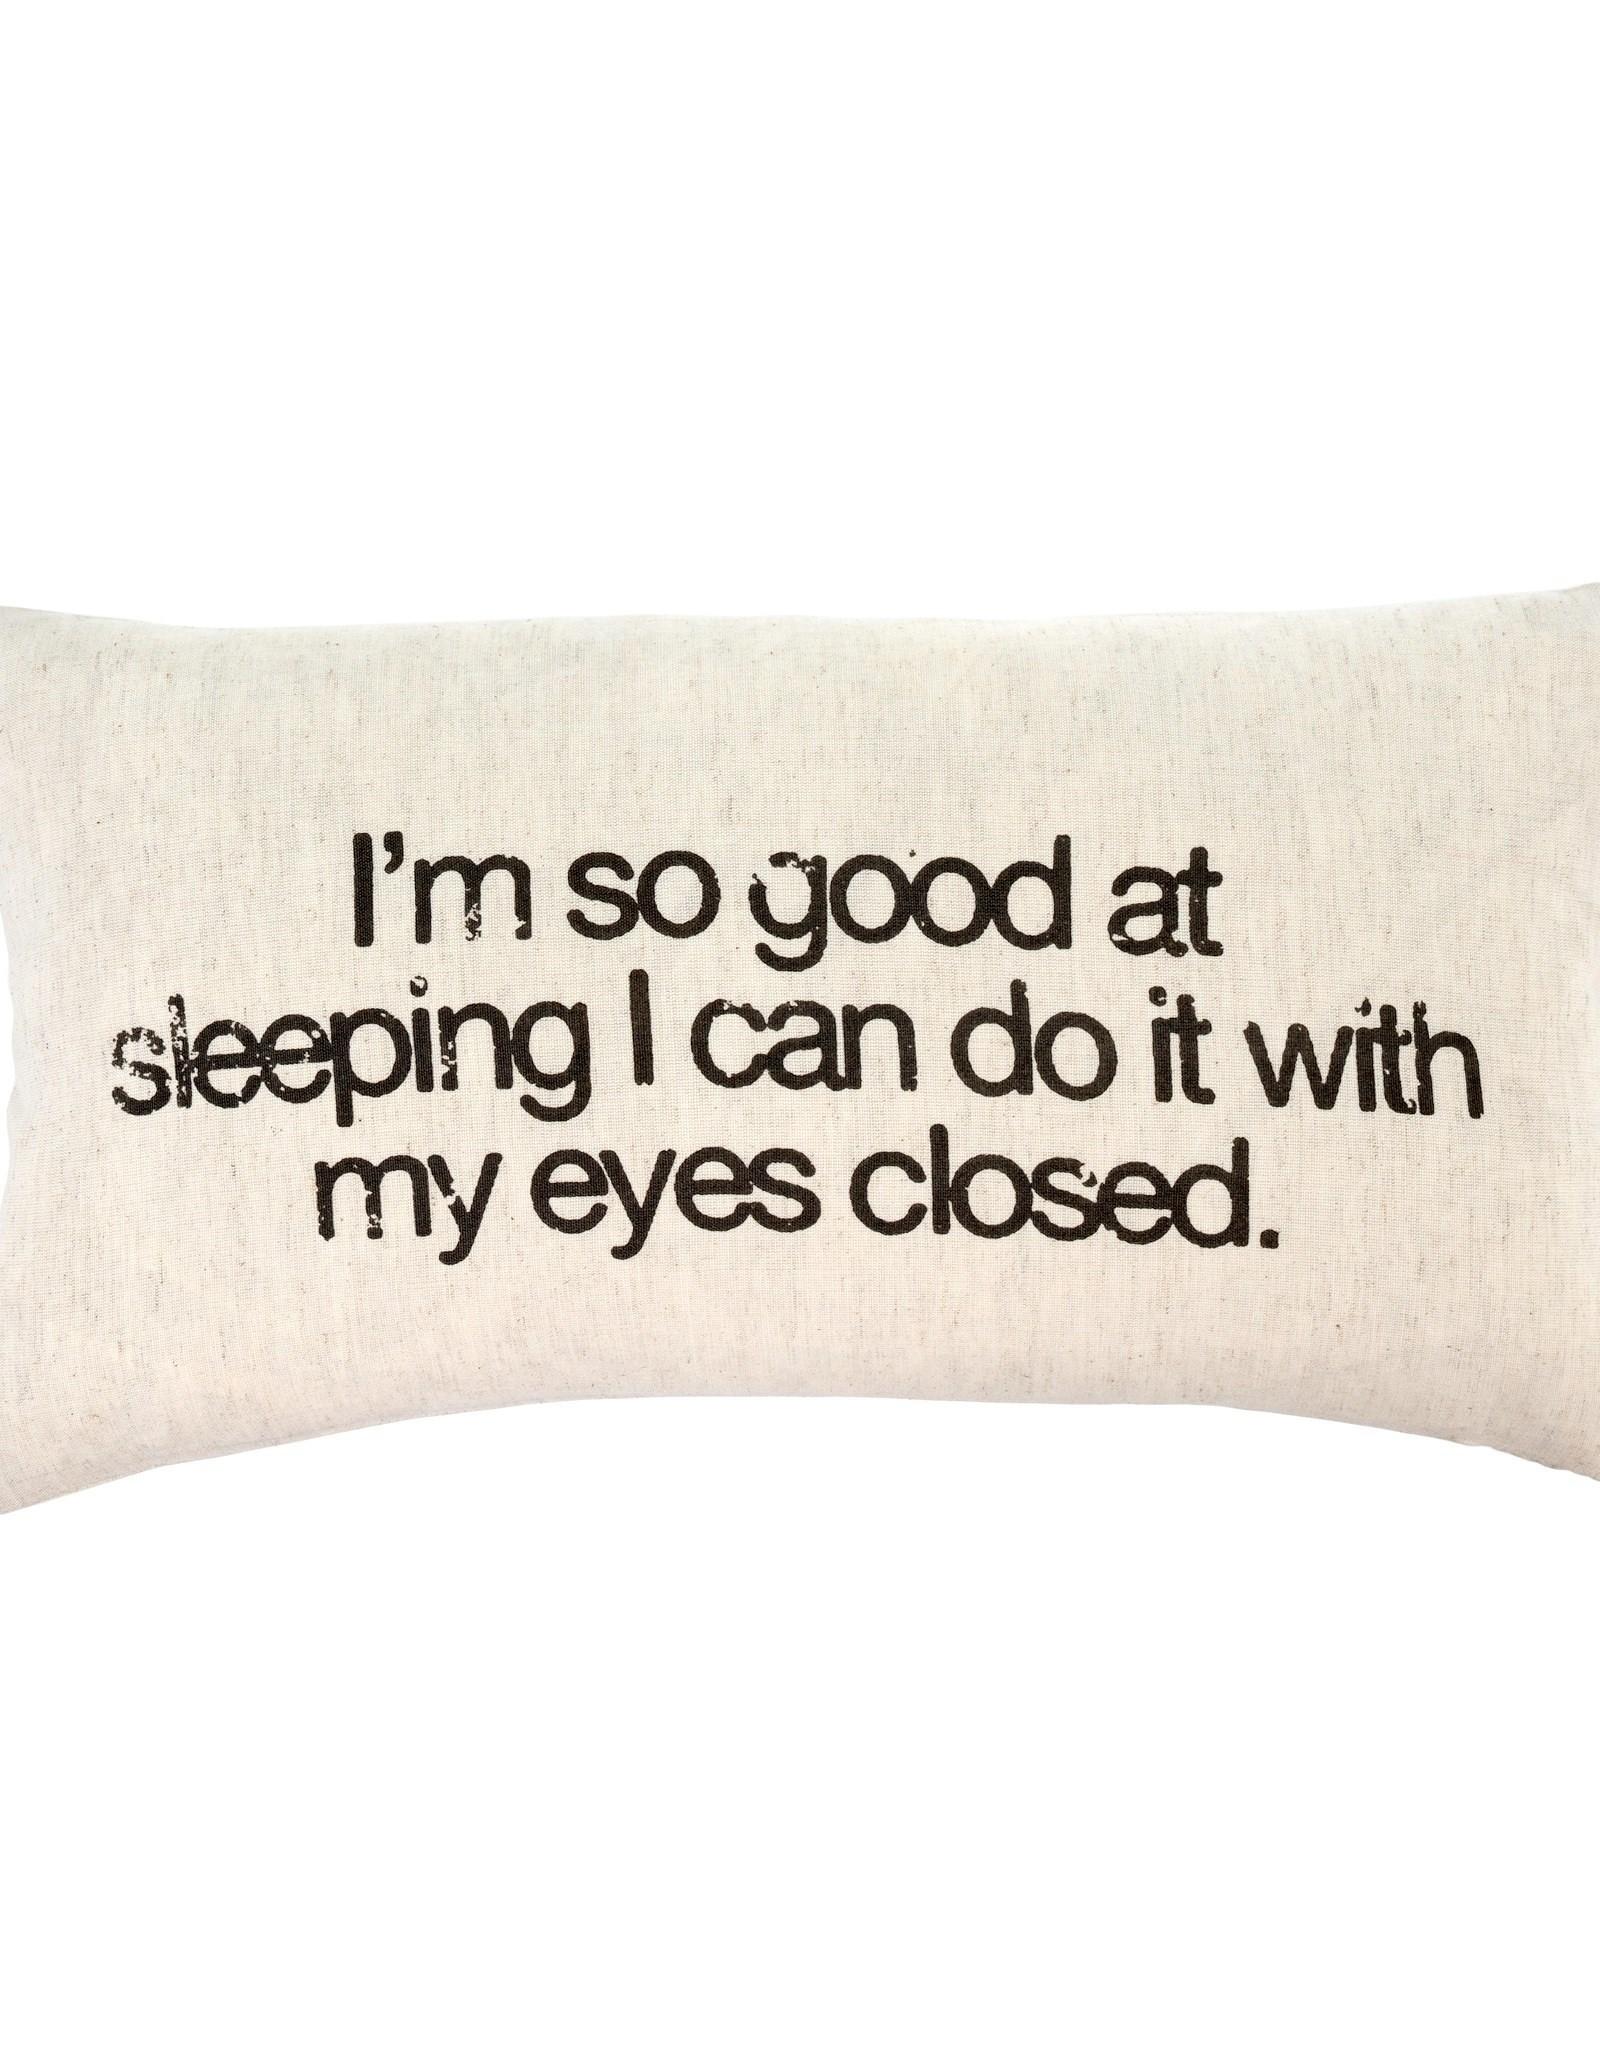 Indaba Cushions Indaba Good At Sleeping 21 x 12 1-8781